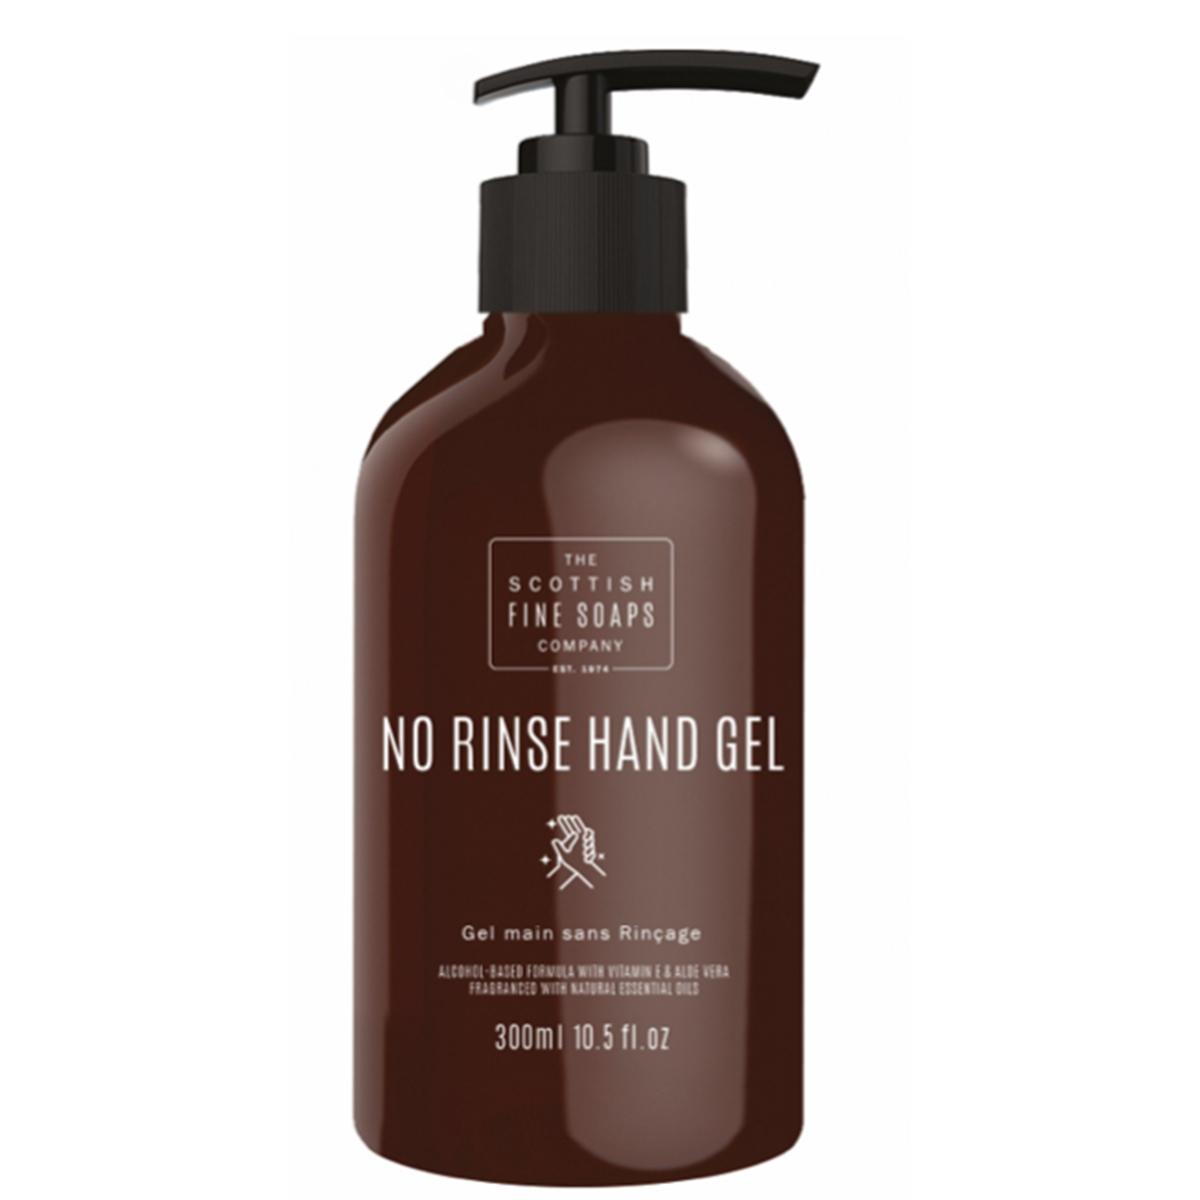 Scottish Fine Soaps No Rinse Moisturising Hand Gel 300ml